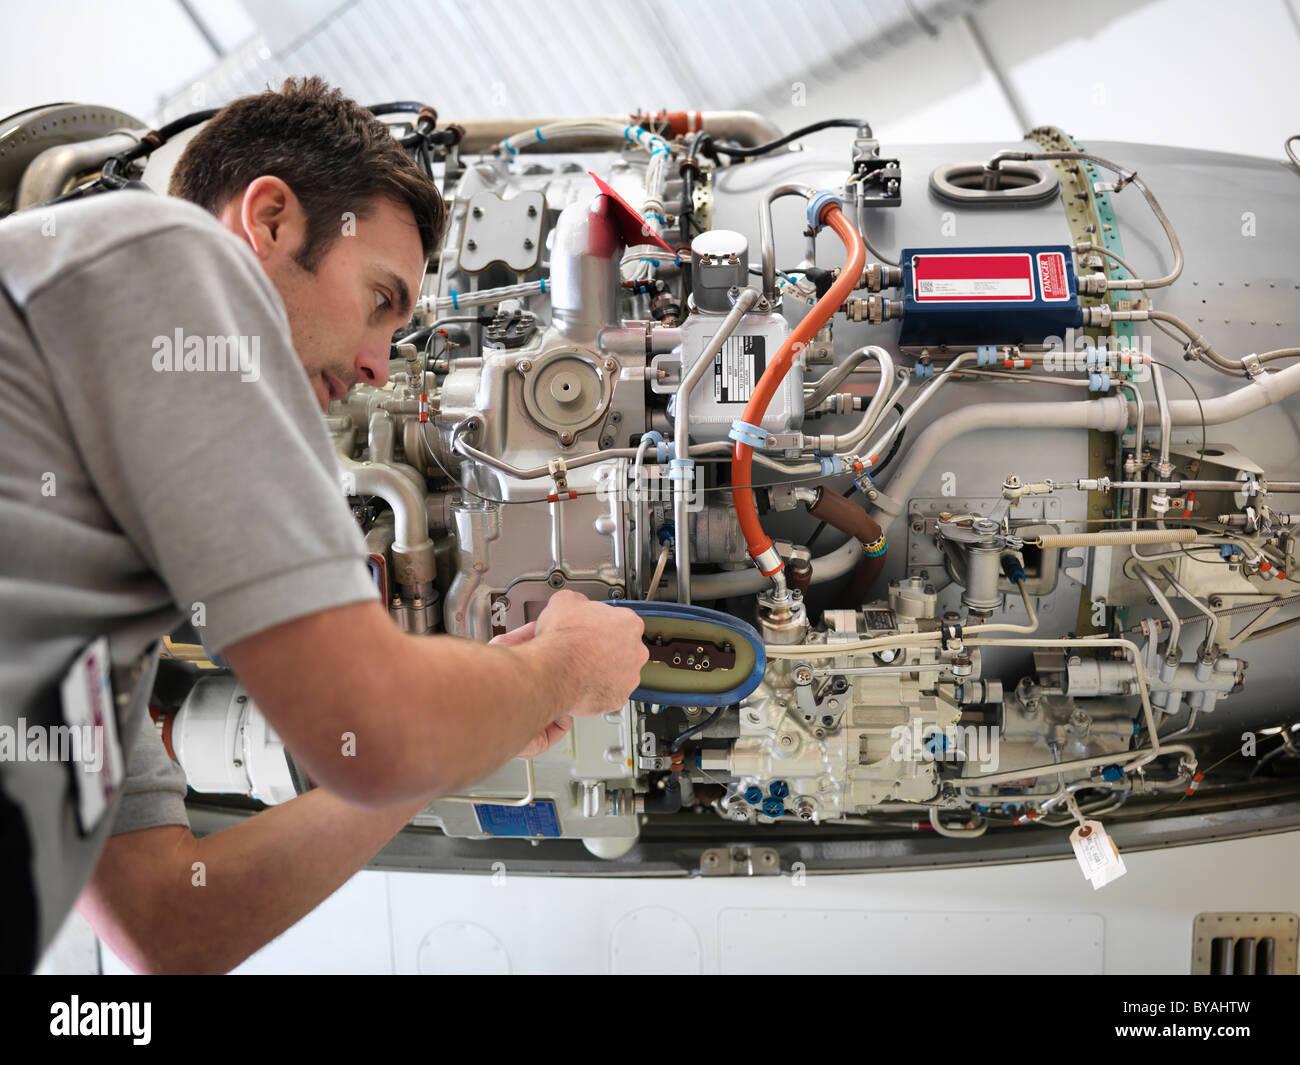 Engineer works on jet engine - Stock Image